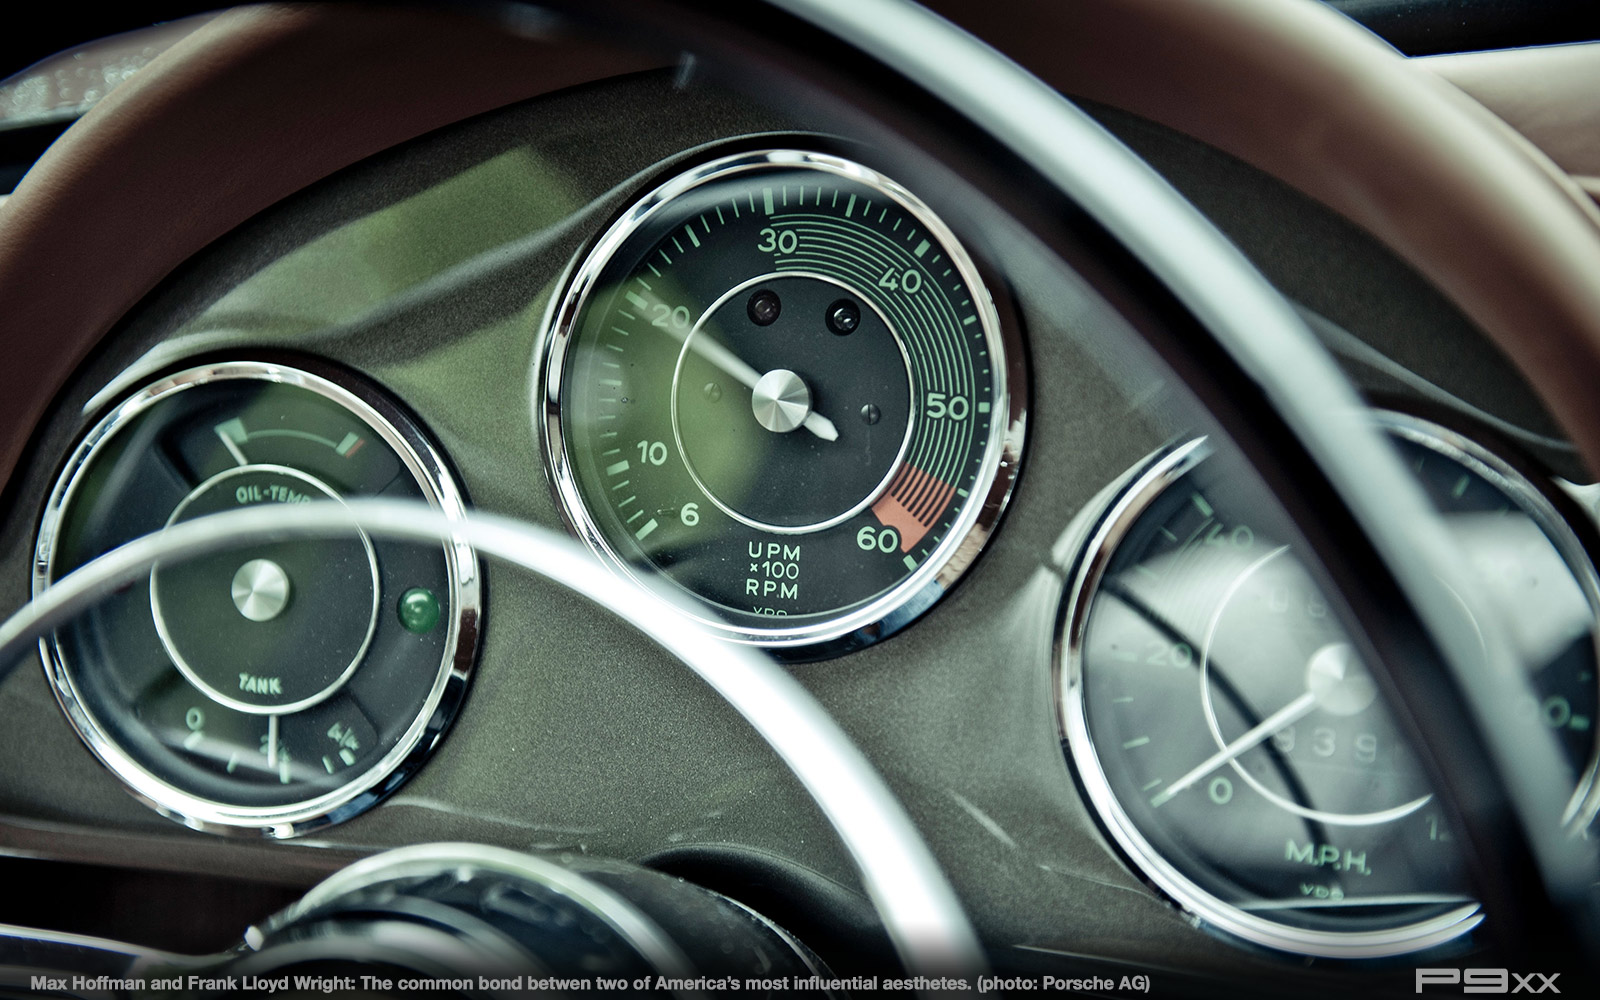 Max-Hoffman-Frank-Lloyd-Wright-Porsche-356-334